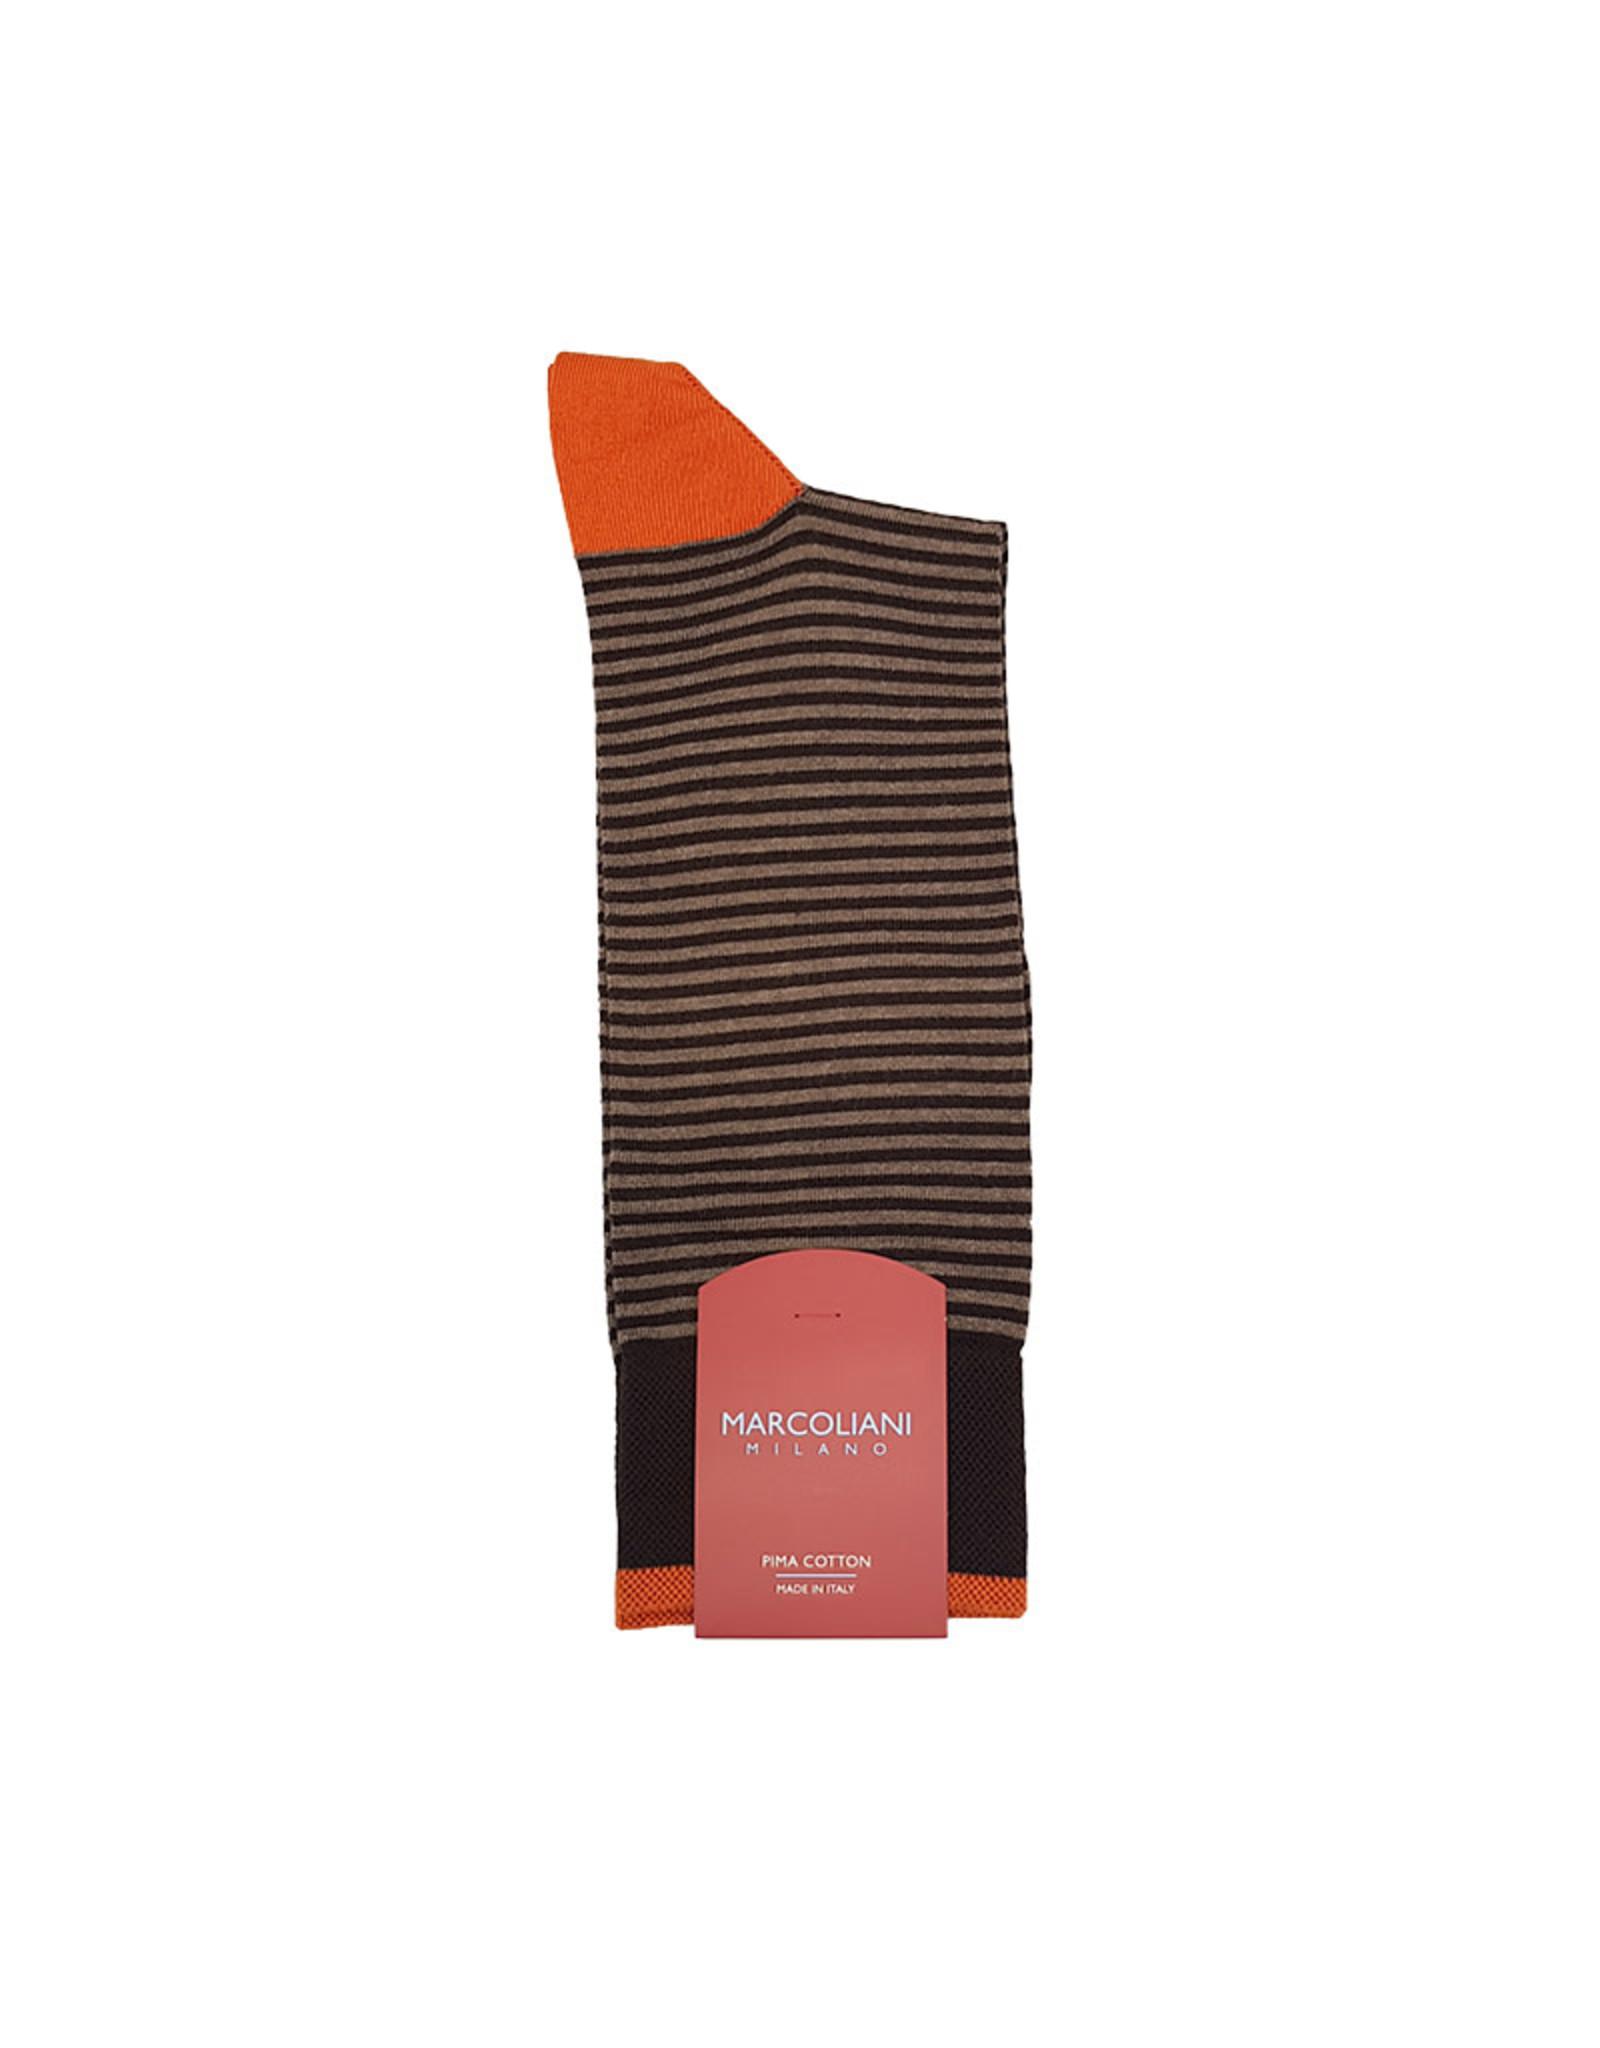 Marcoliani Marcoliani sokken bruin 3231T/258